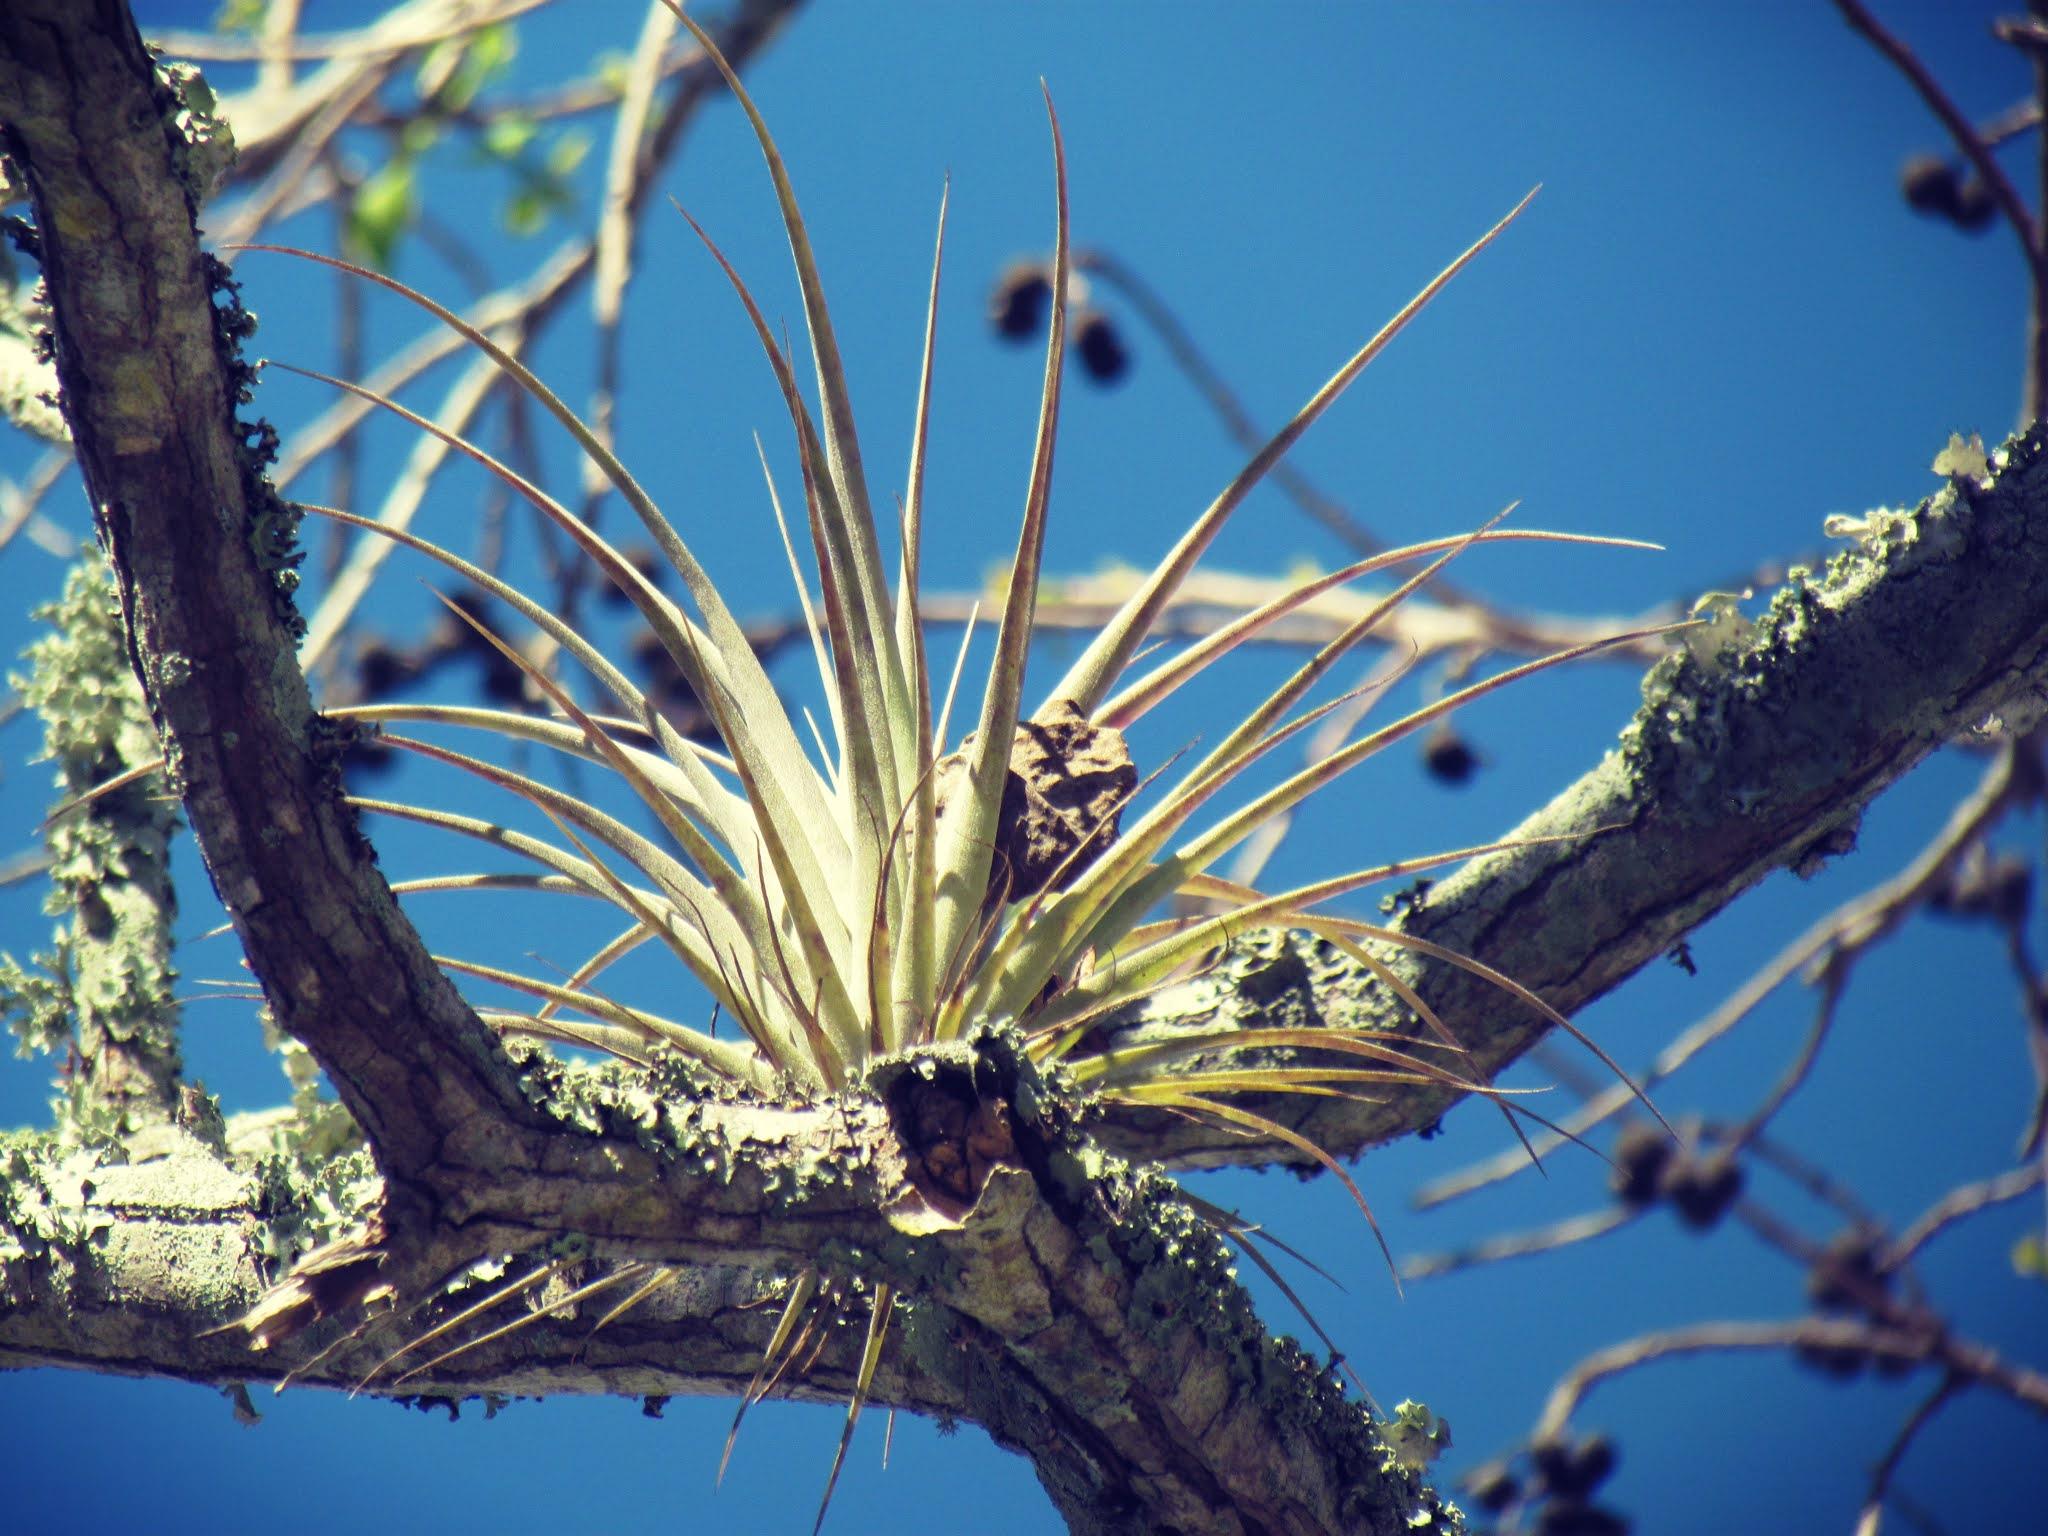 Florida native air plants, tillandsia plant family, air plant species, plant magic, green magic healing, plant energy healing